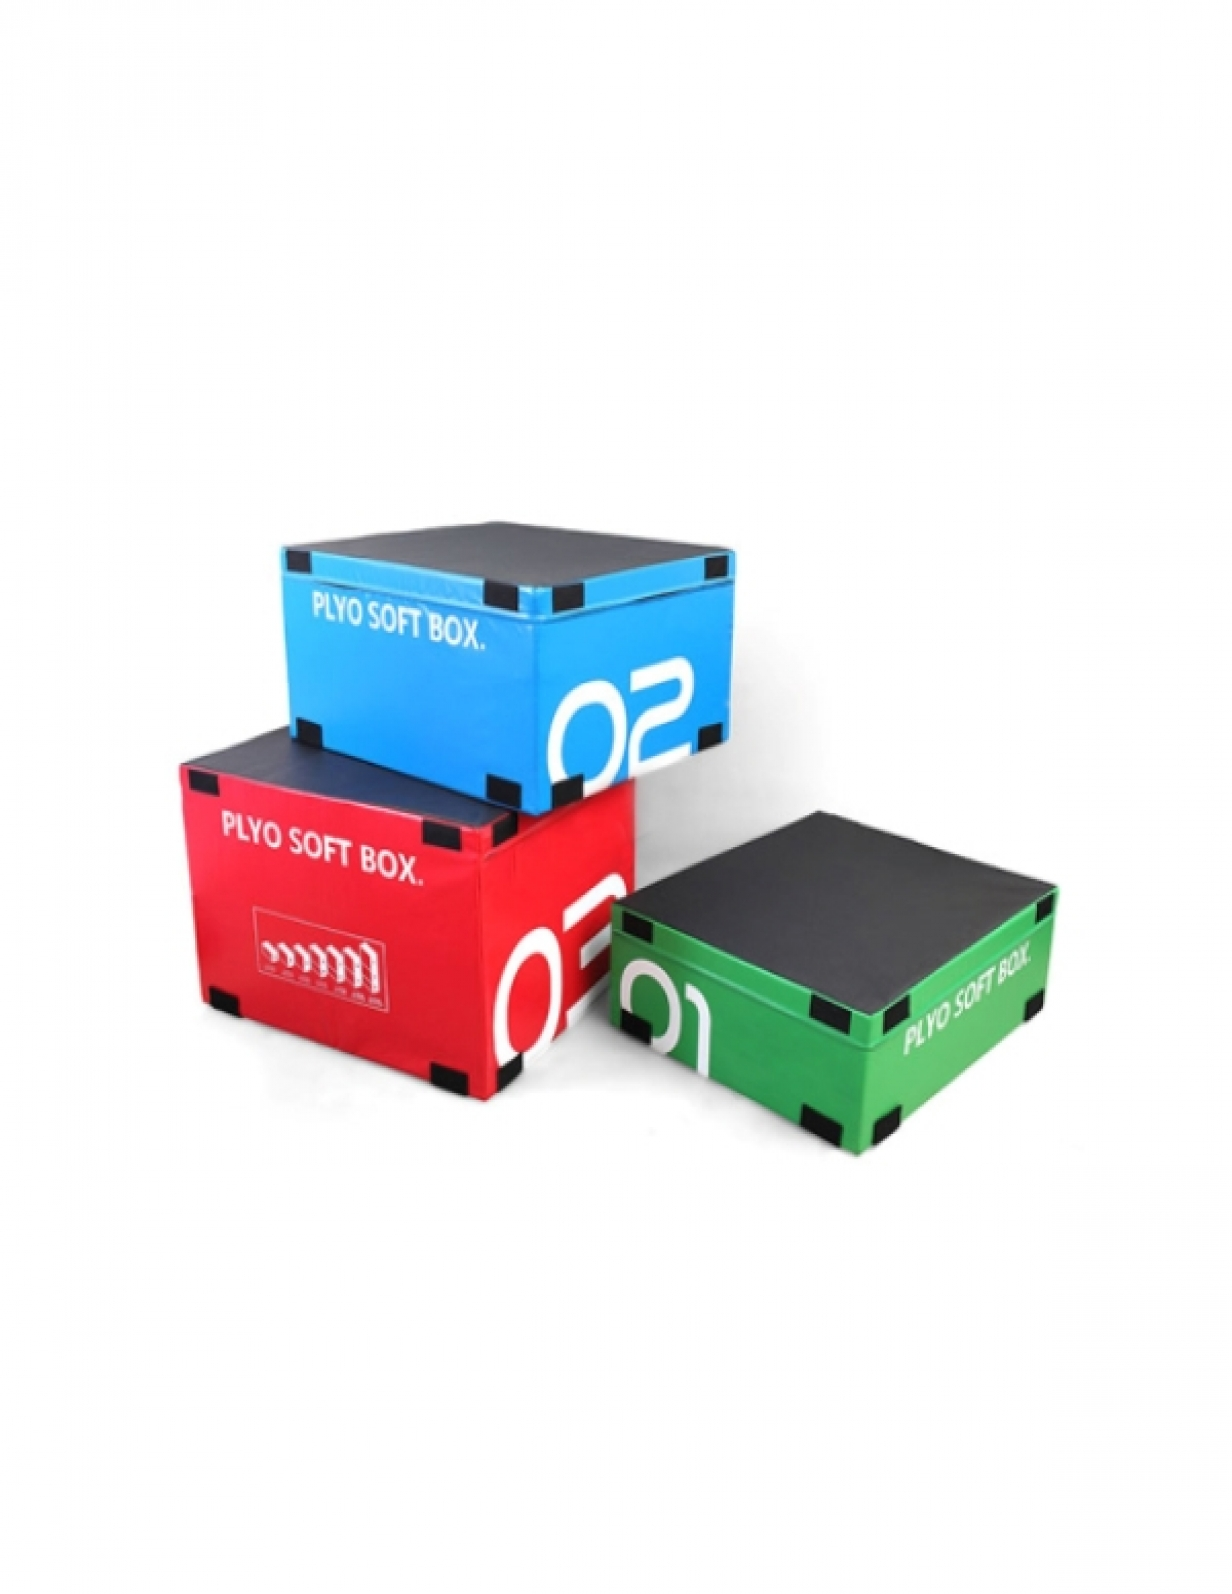 PLYOSOFT BOX